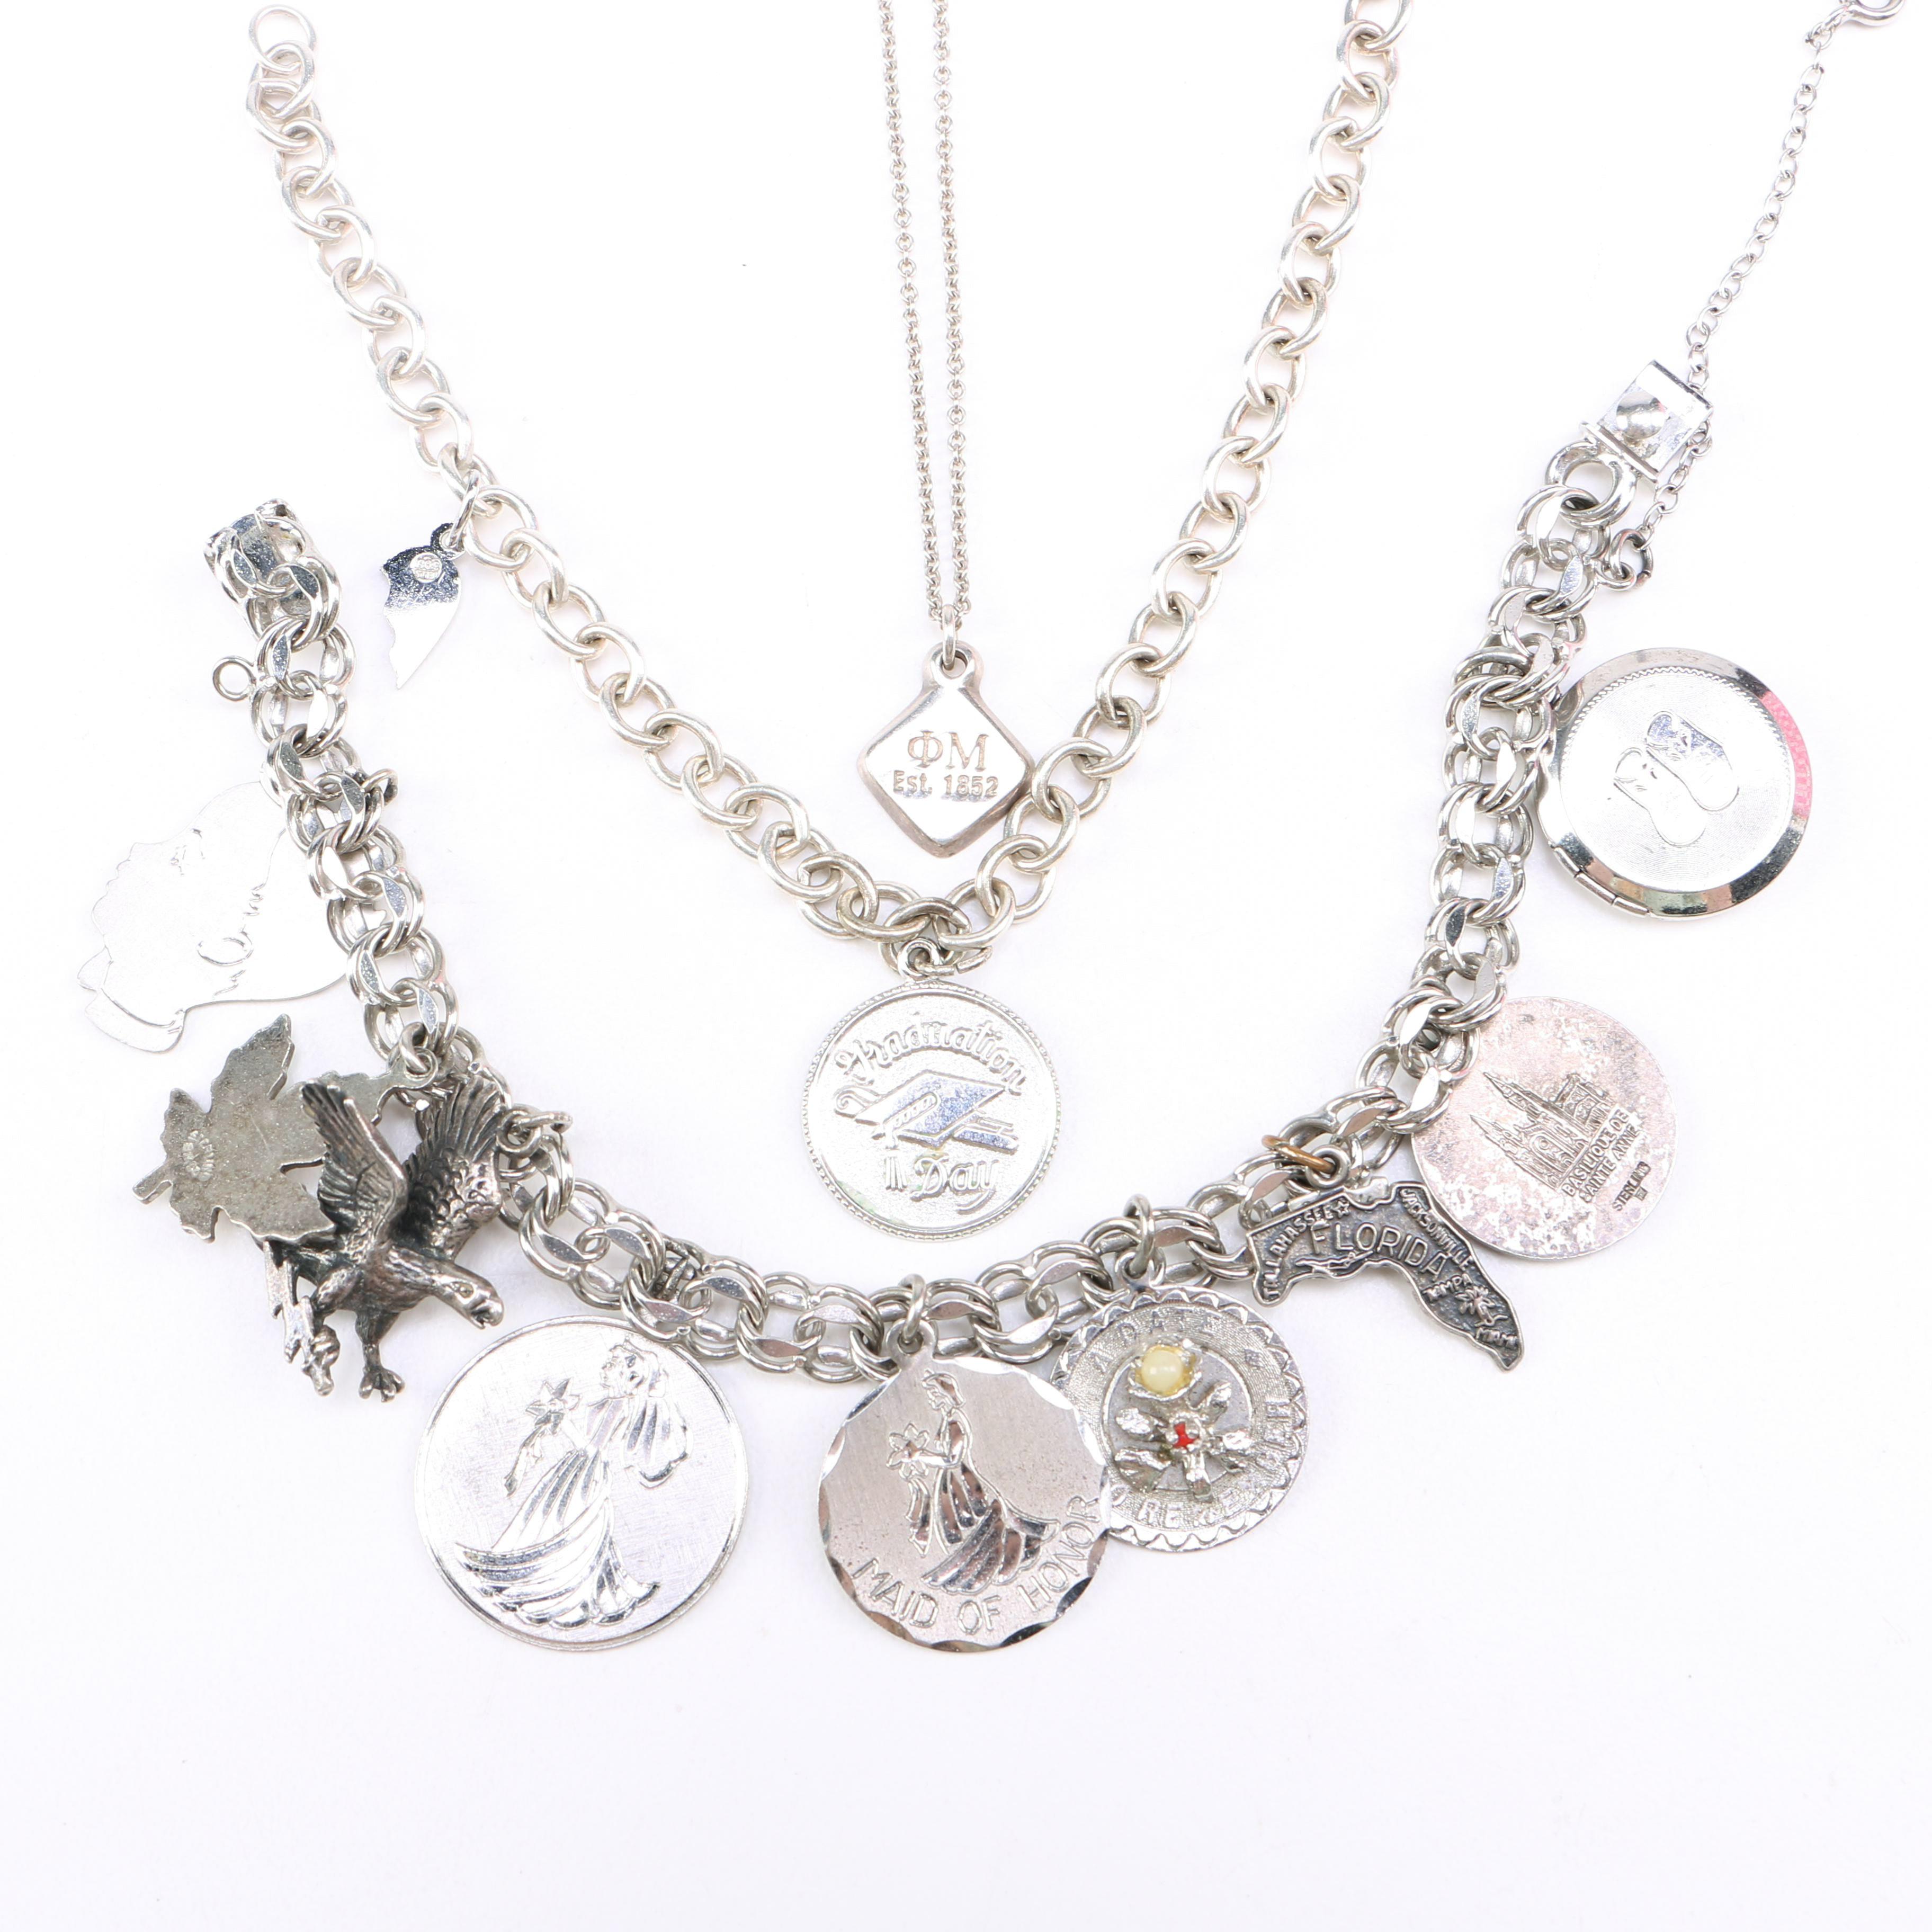 Sterling Silver Charm Bracelets and Necklace